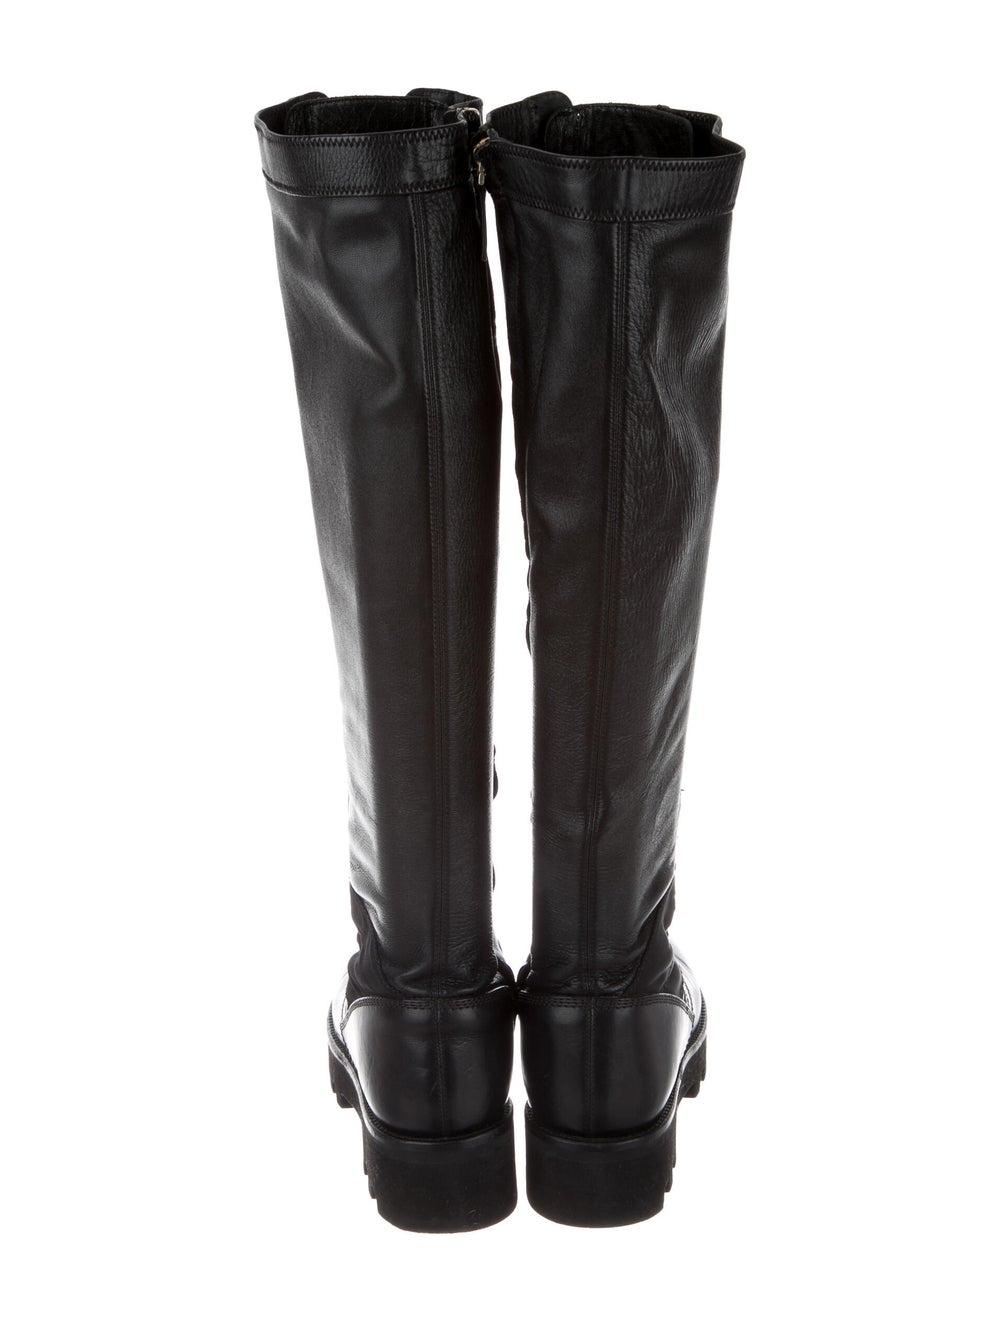 Altuzarra Leather Combat Boots Black - image 4